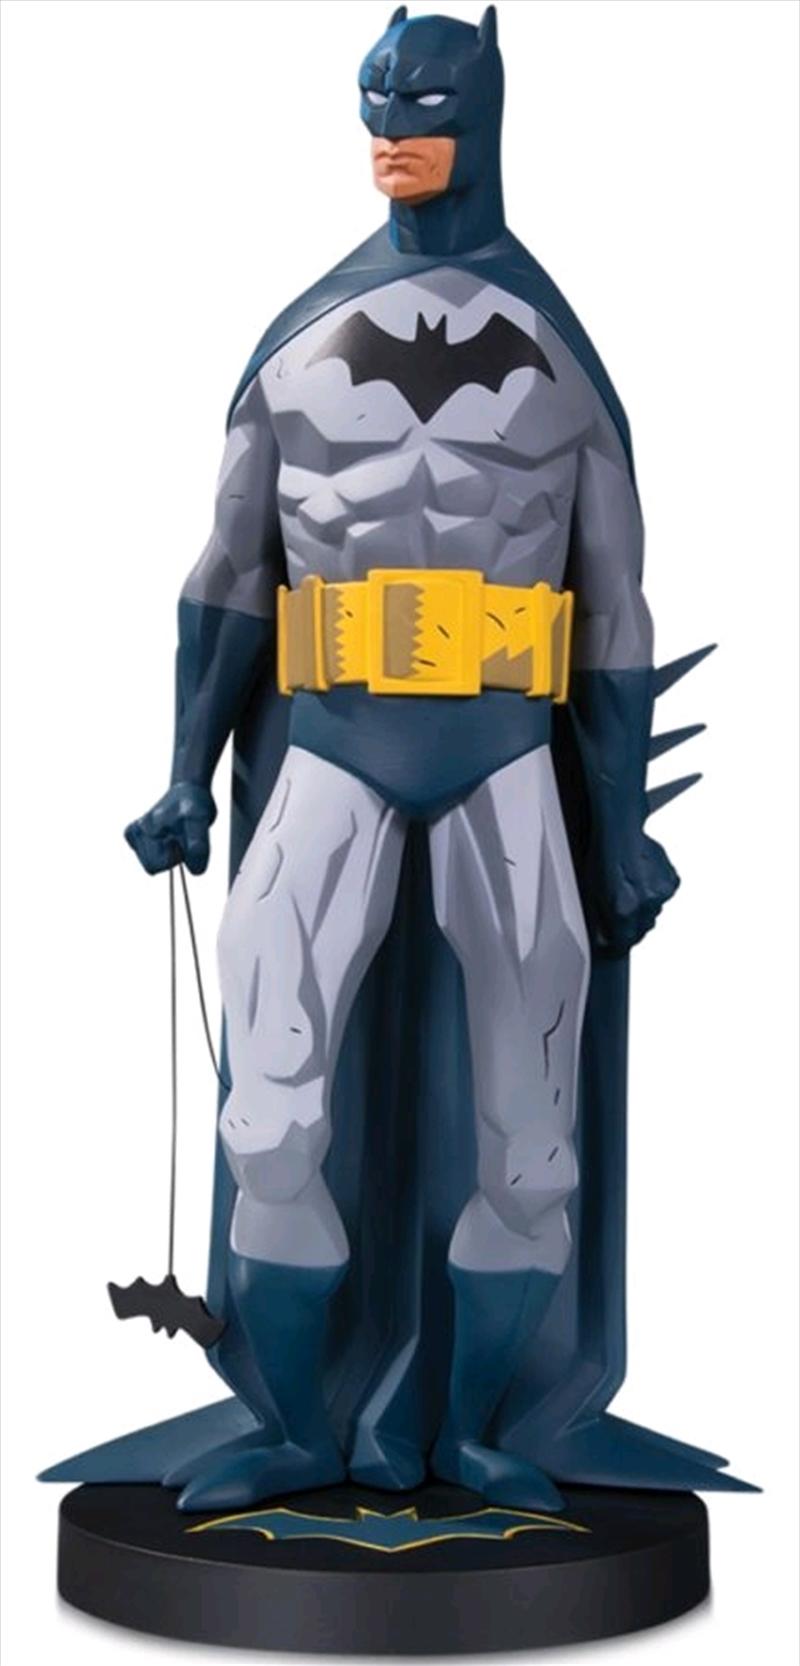 Batman - Batman by Mike Mignola Designer Mini Statue | Merchandise